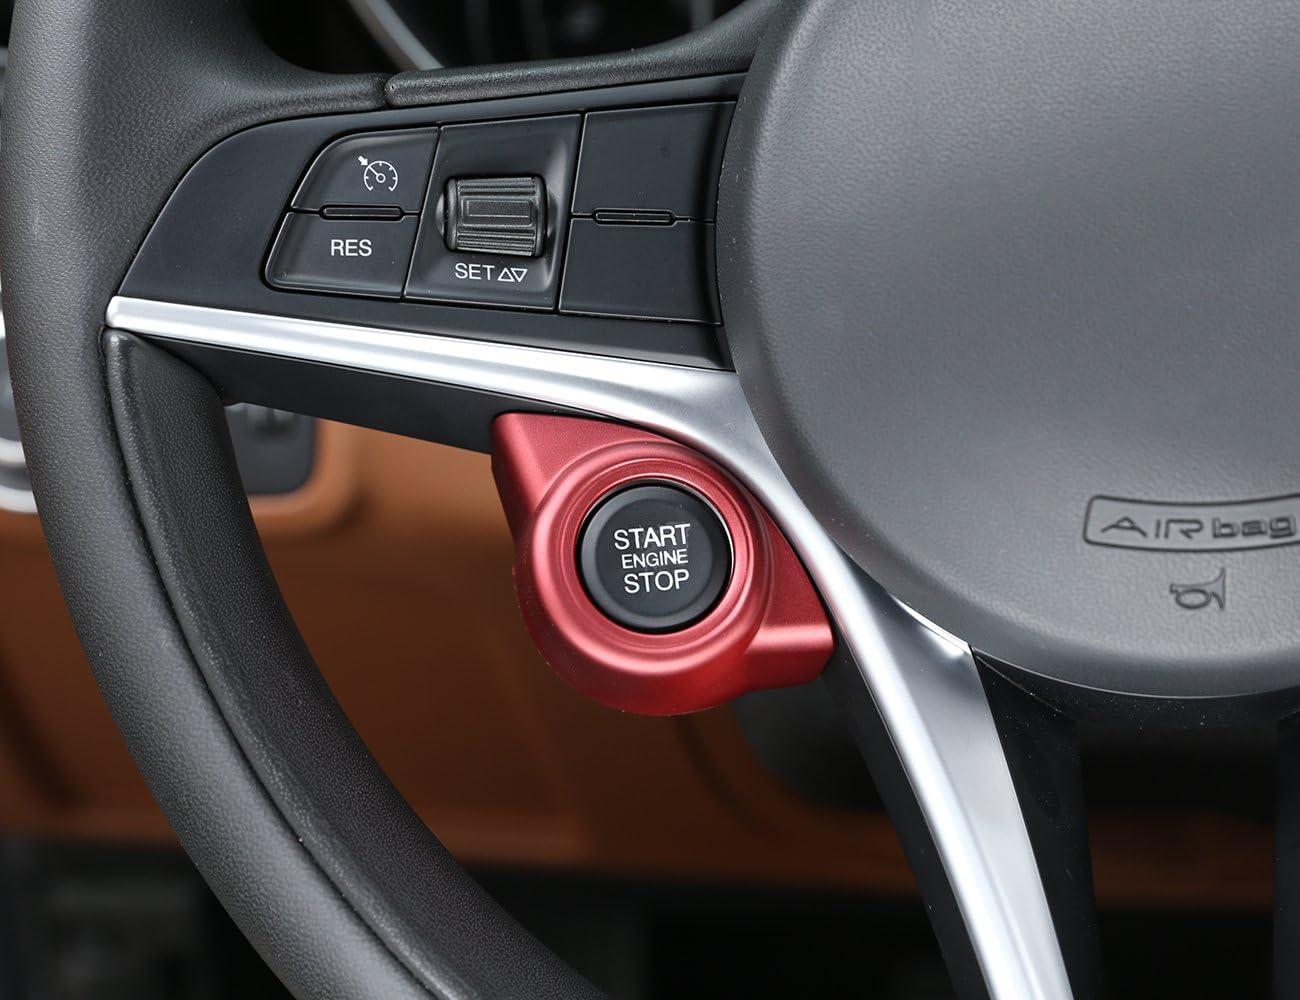 For Alfa Romeo Giulia Stelvio 2017 2018 2019 ABS Accessories Plastic Car Start Engine Stop Cover Trim